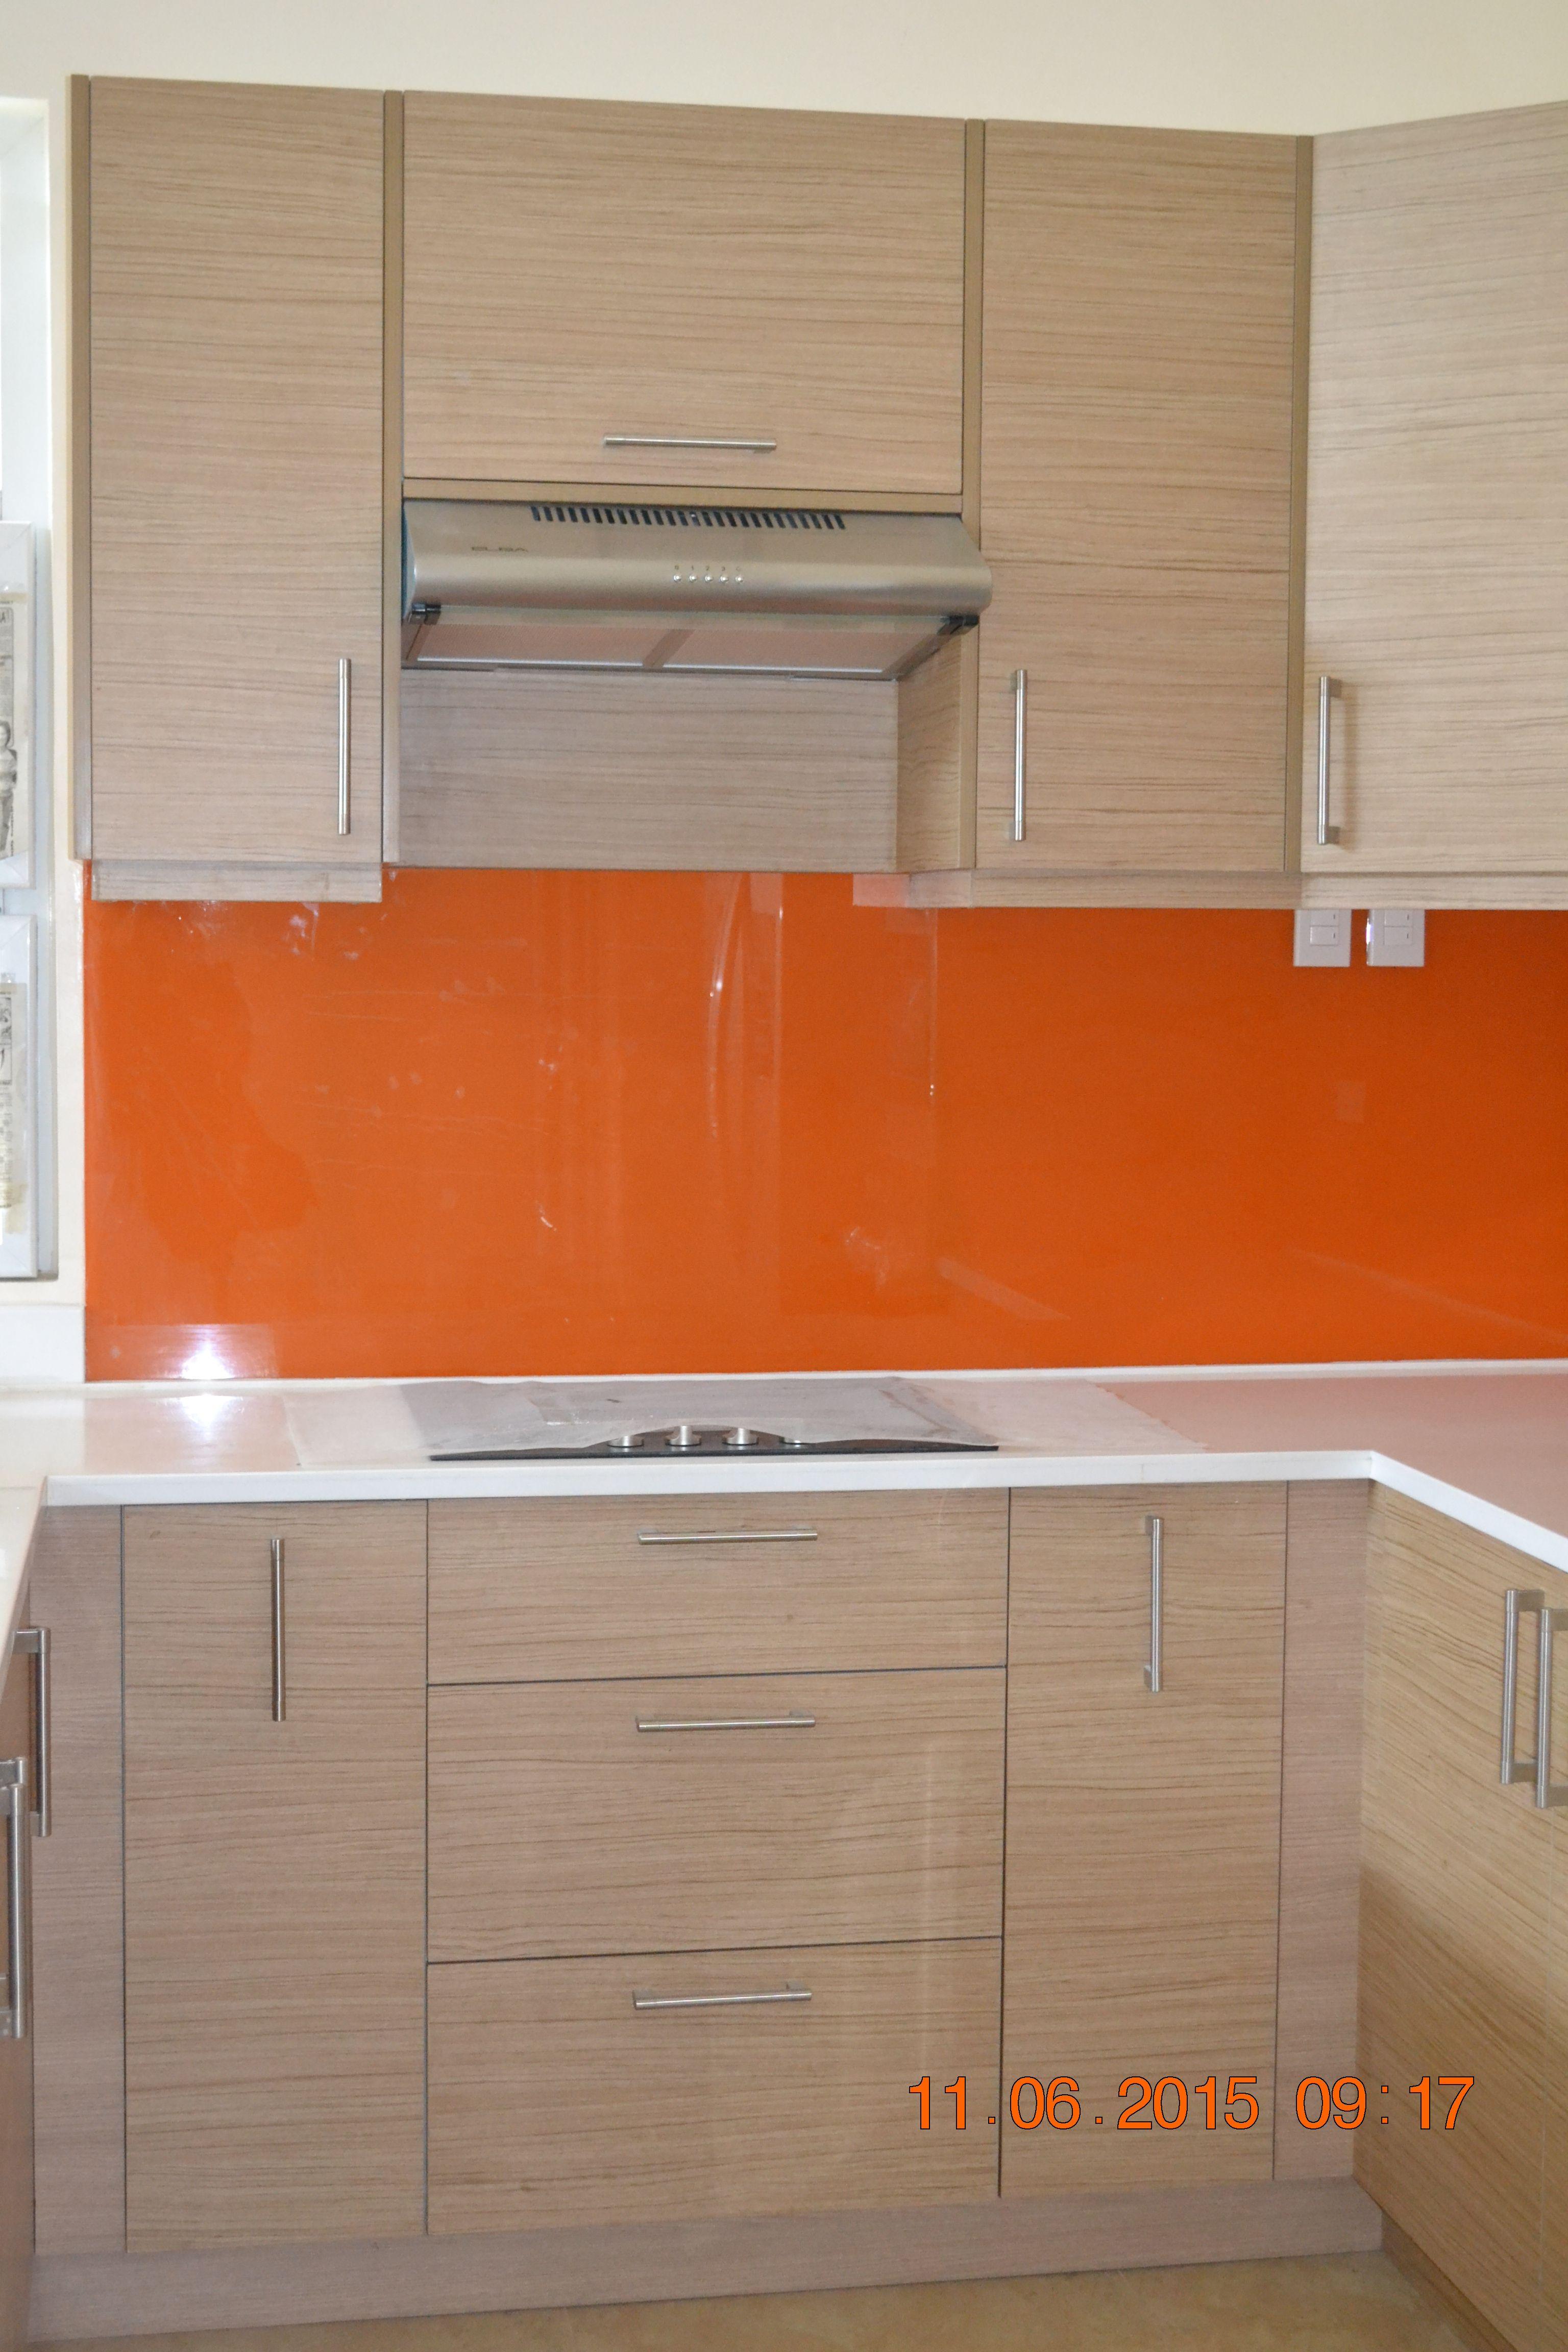 Melamine Woodgrain Royal Oak Finish With Graphicoat Orange Backsplash Nuestone White Granite Count Modular Kitchen Cabinets Kitchen Upgrades Kitchen Cabinets